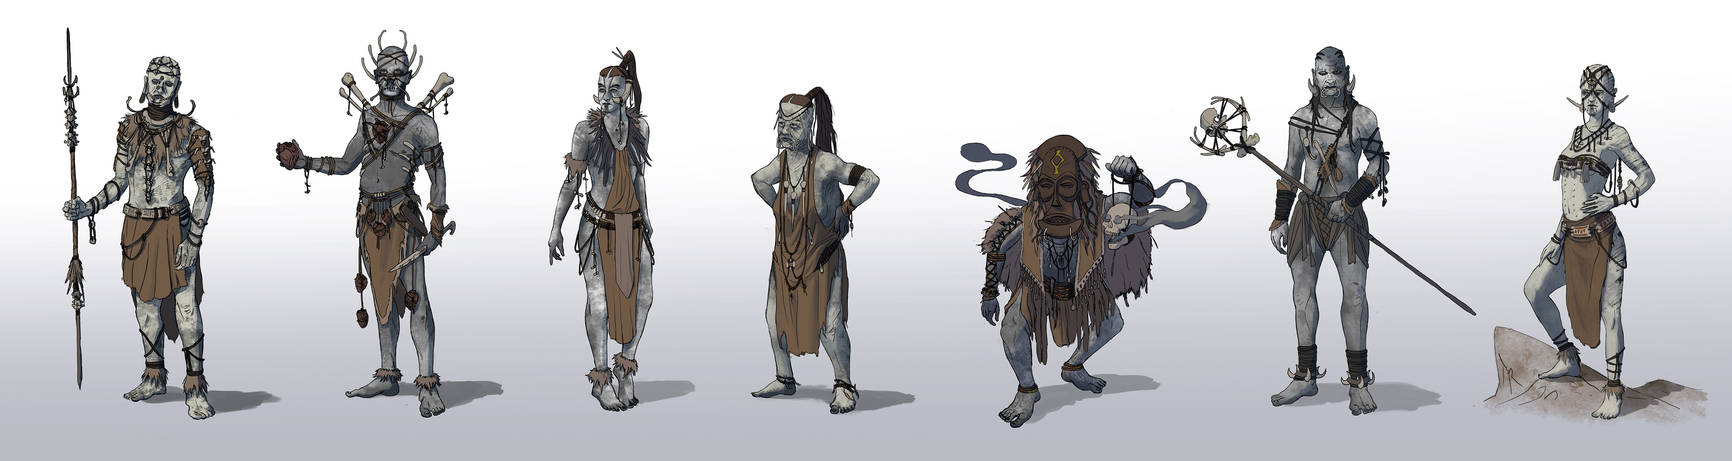 Kacha - Laba Tribe by EmmanuelMadailArt